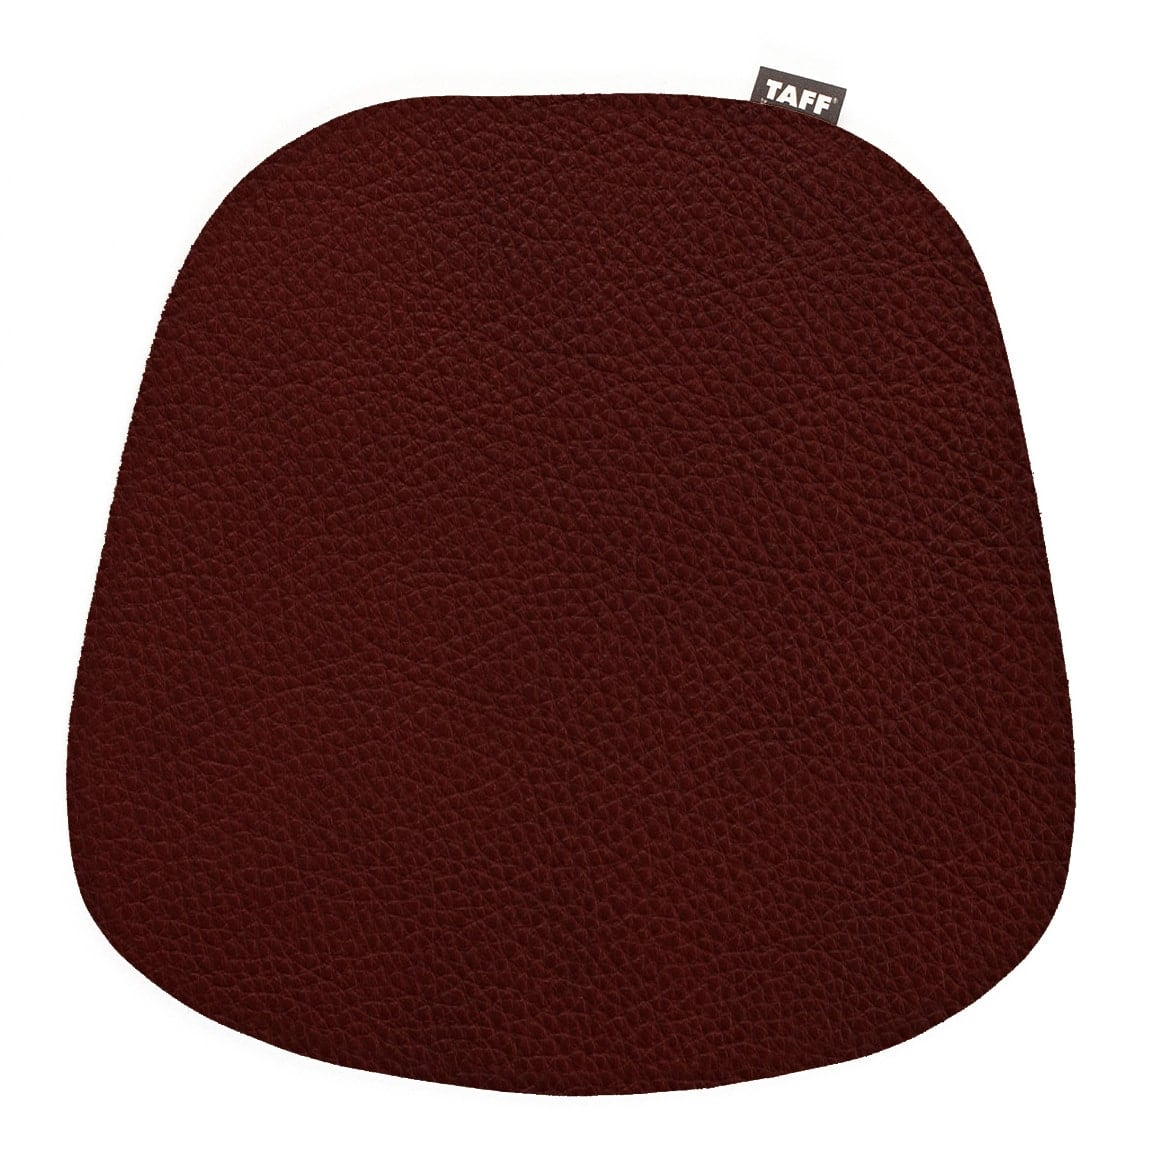 Sitzkissen-Rustik-Leder-Armchair-Kirsche